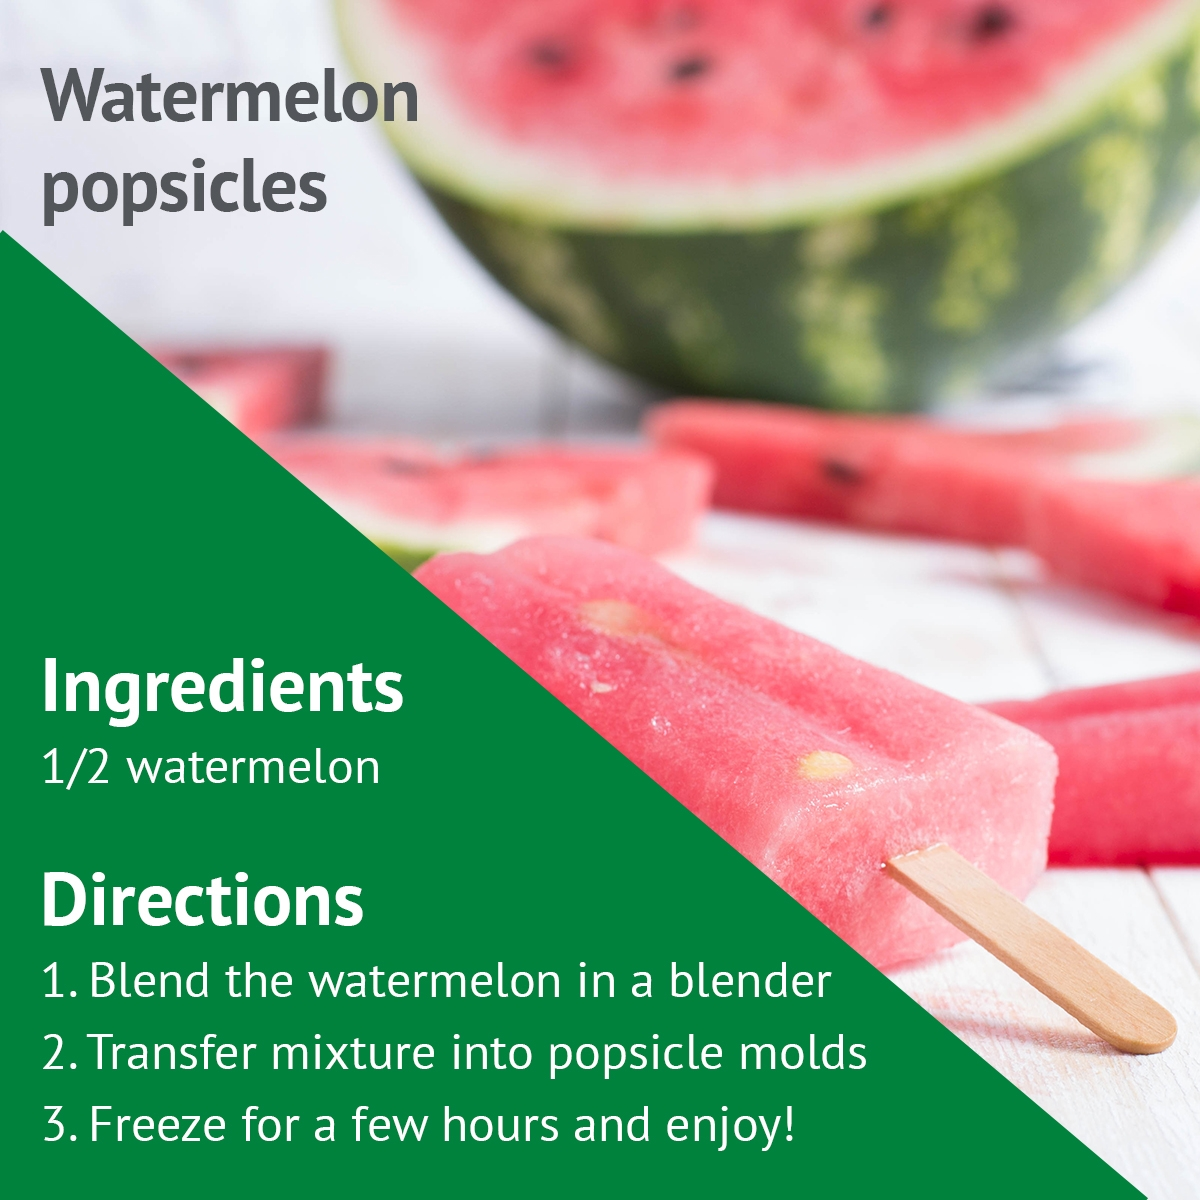 Phelps Hospital Watermelon Popsicle Recipe 2019